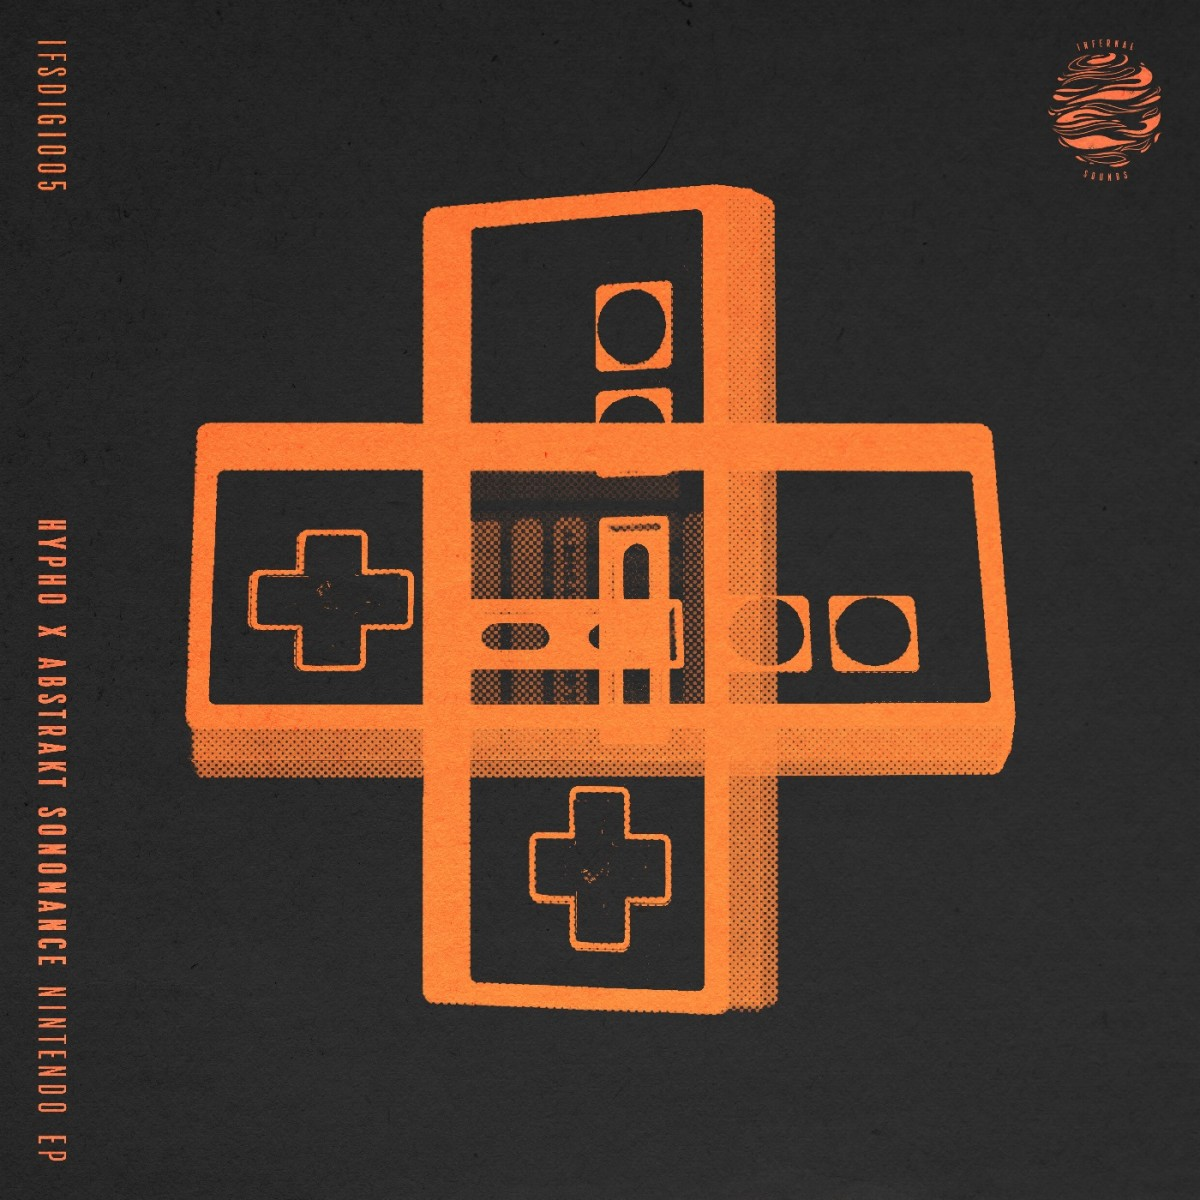 Hypho X Abstrakt Sonance - Take It Or Leave It (Feat Rakjay) [IFSDIGI005]